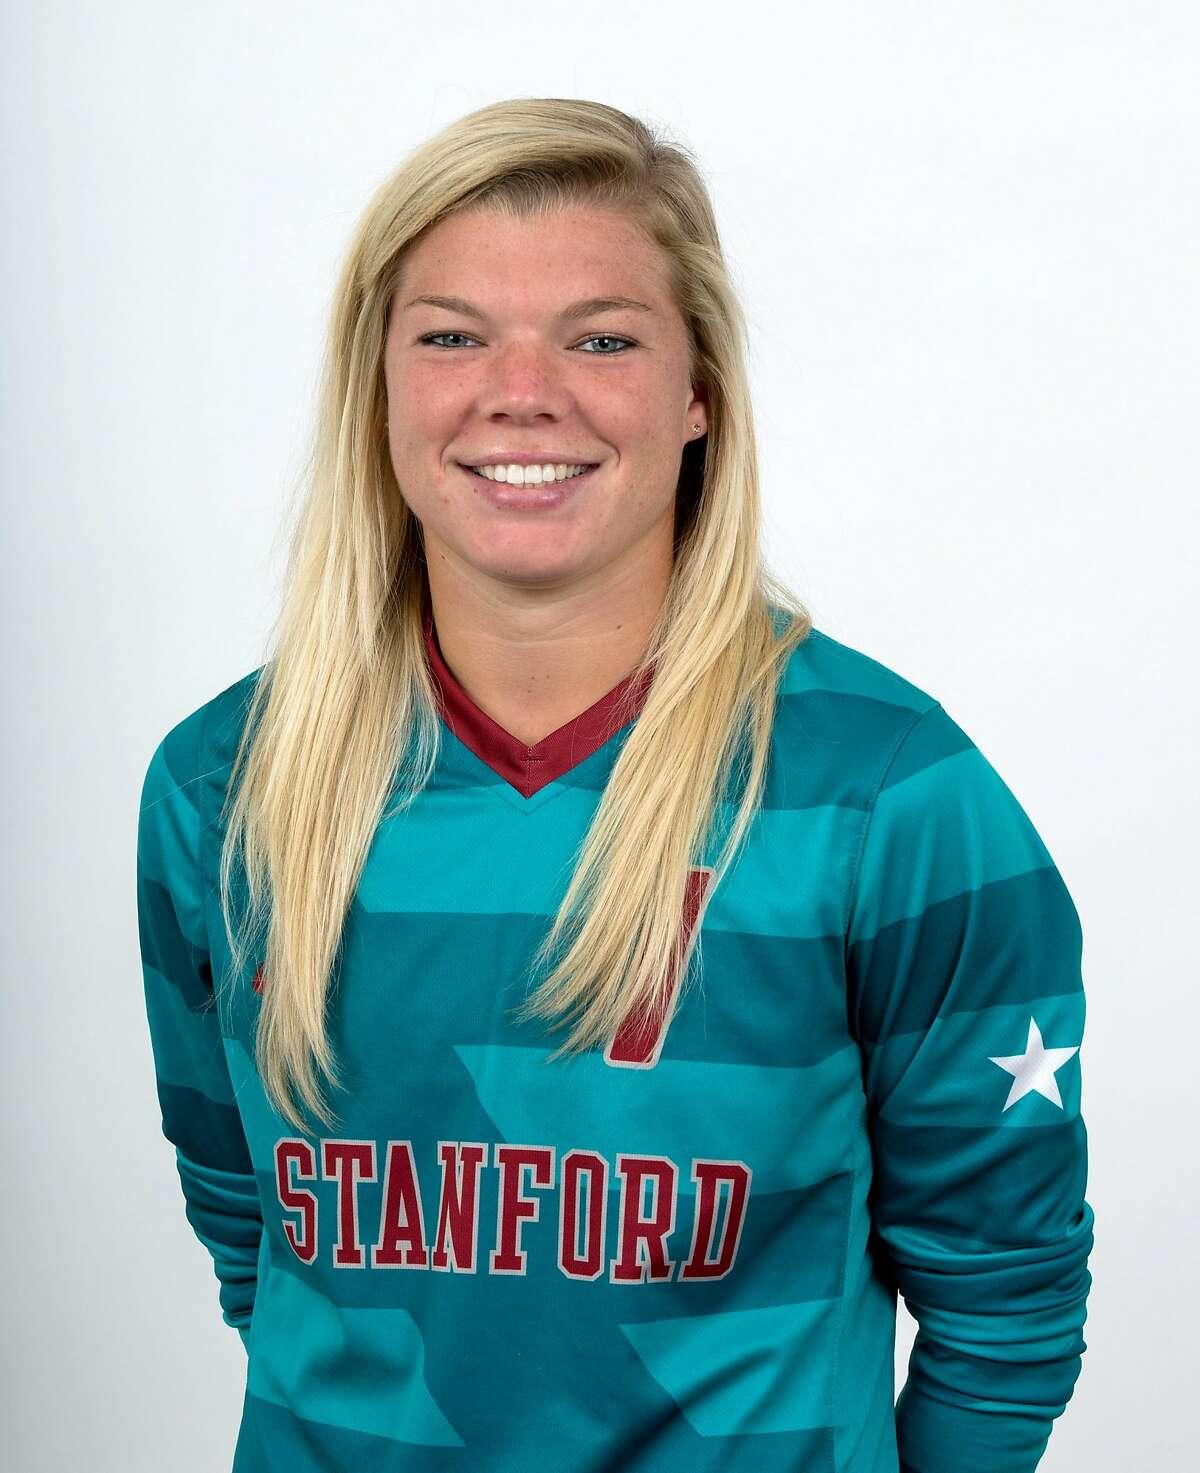 Jane Campbell STANFORD, CA - SEPTEMBER 5, 2014--Jane Campbell, of the Stanford Women's Soccer team.